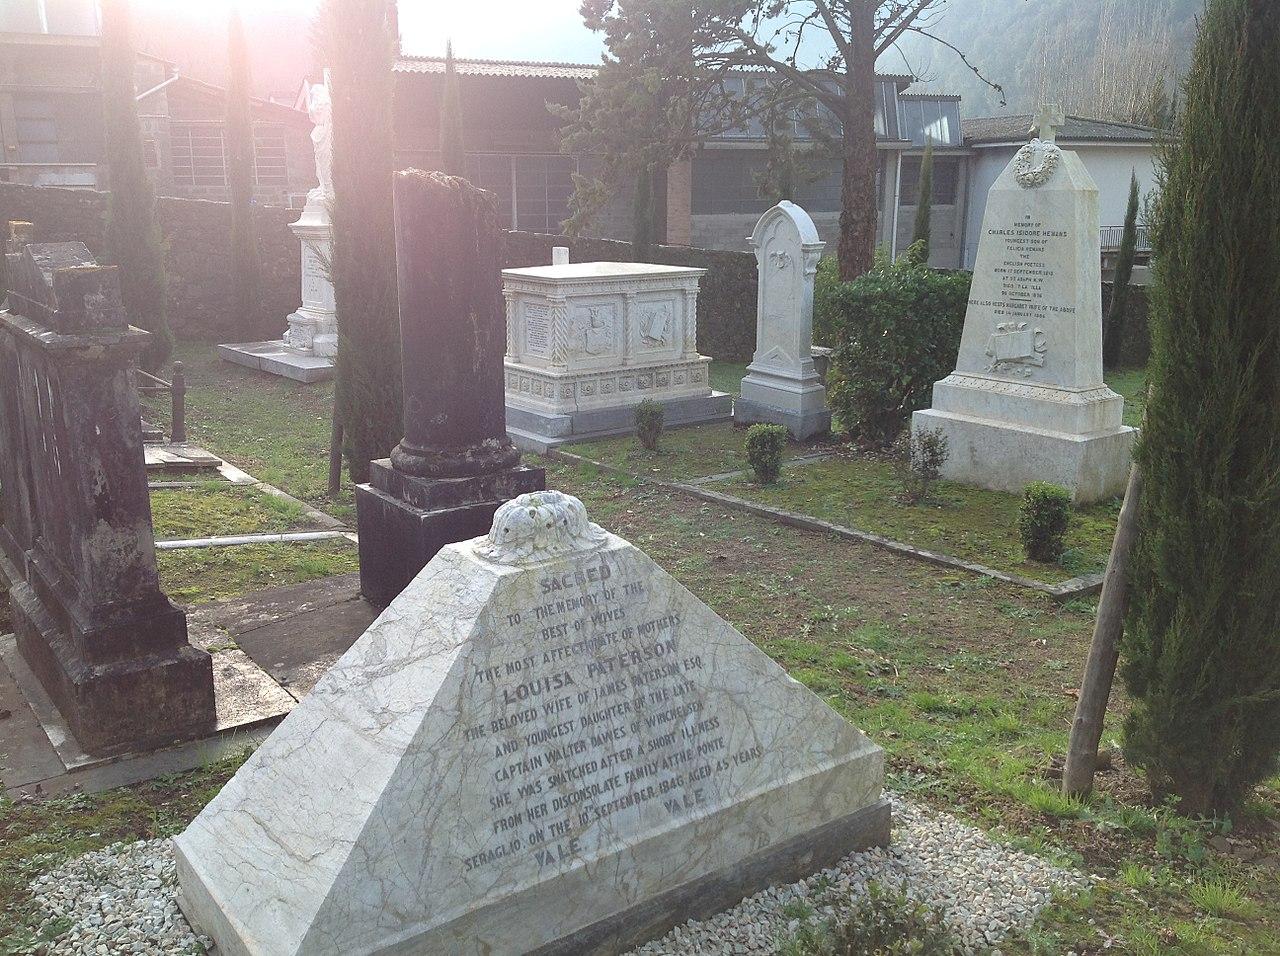 File cimitero inglese bagni di lucca louisa paterson died 1846 jpg wikipedia - Bagni di lucca ...